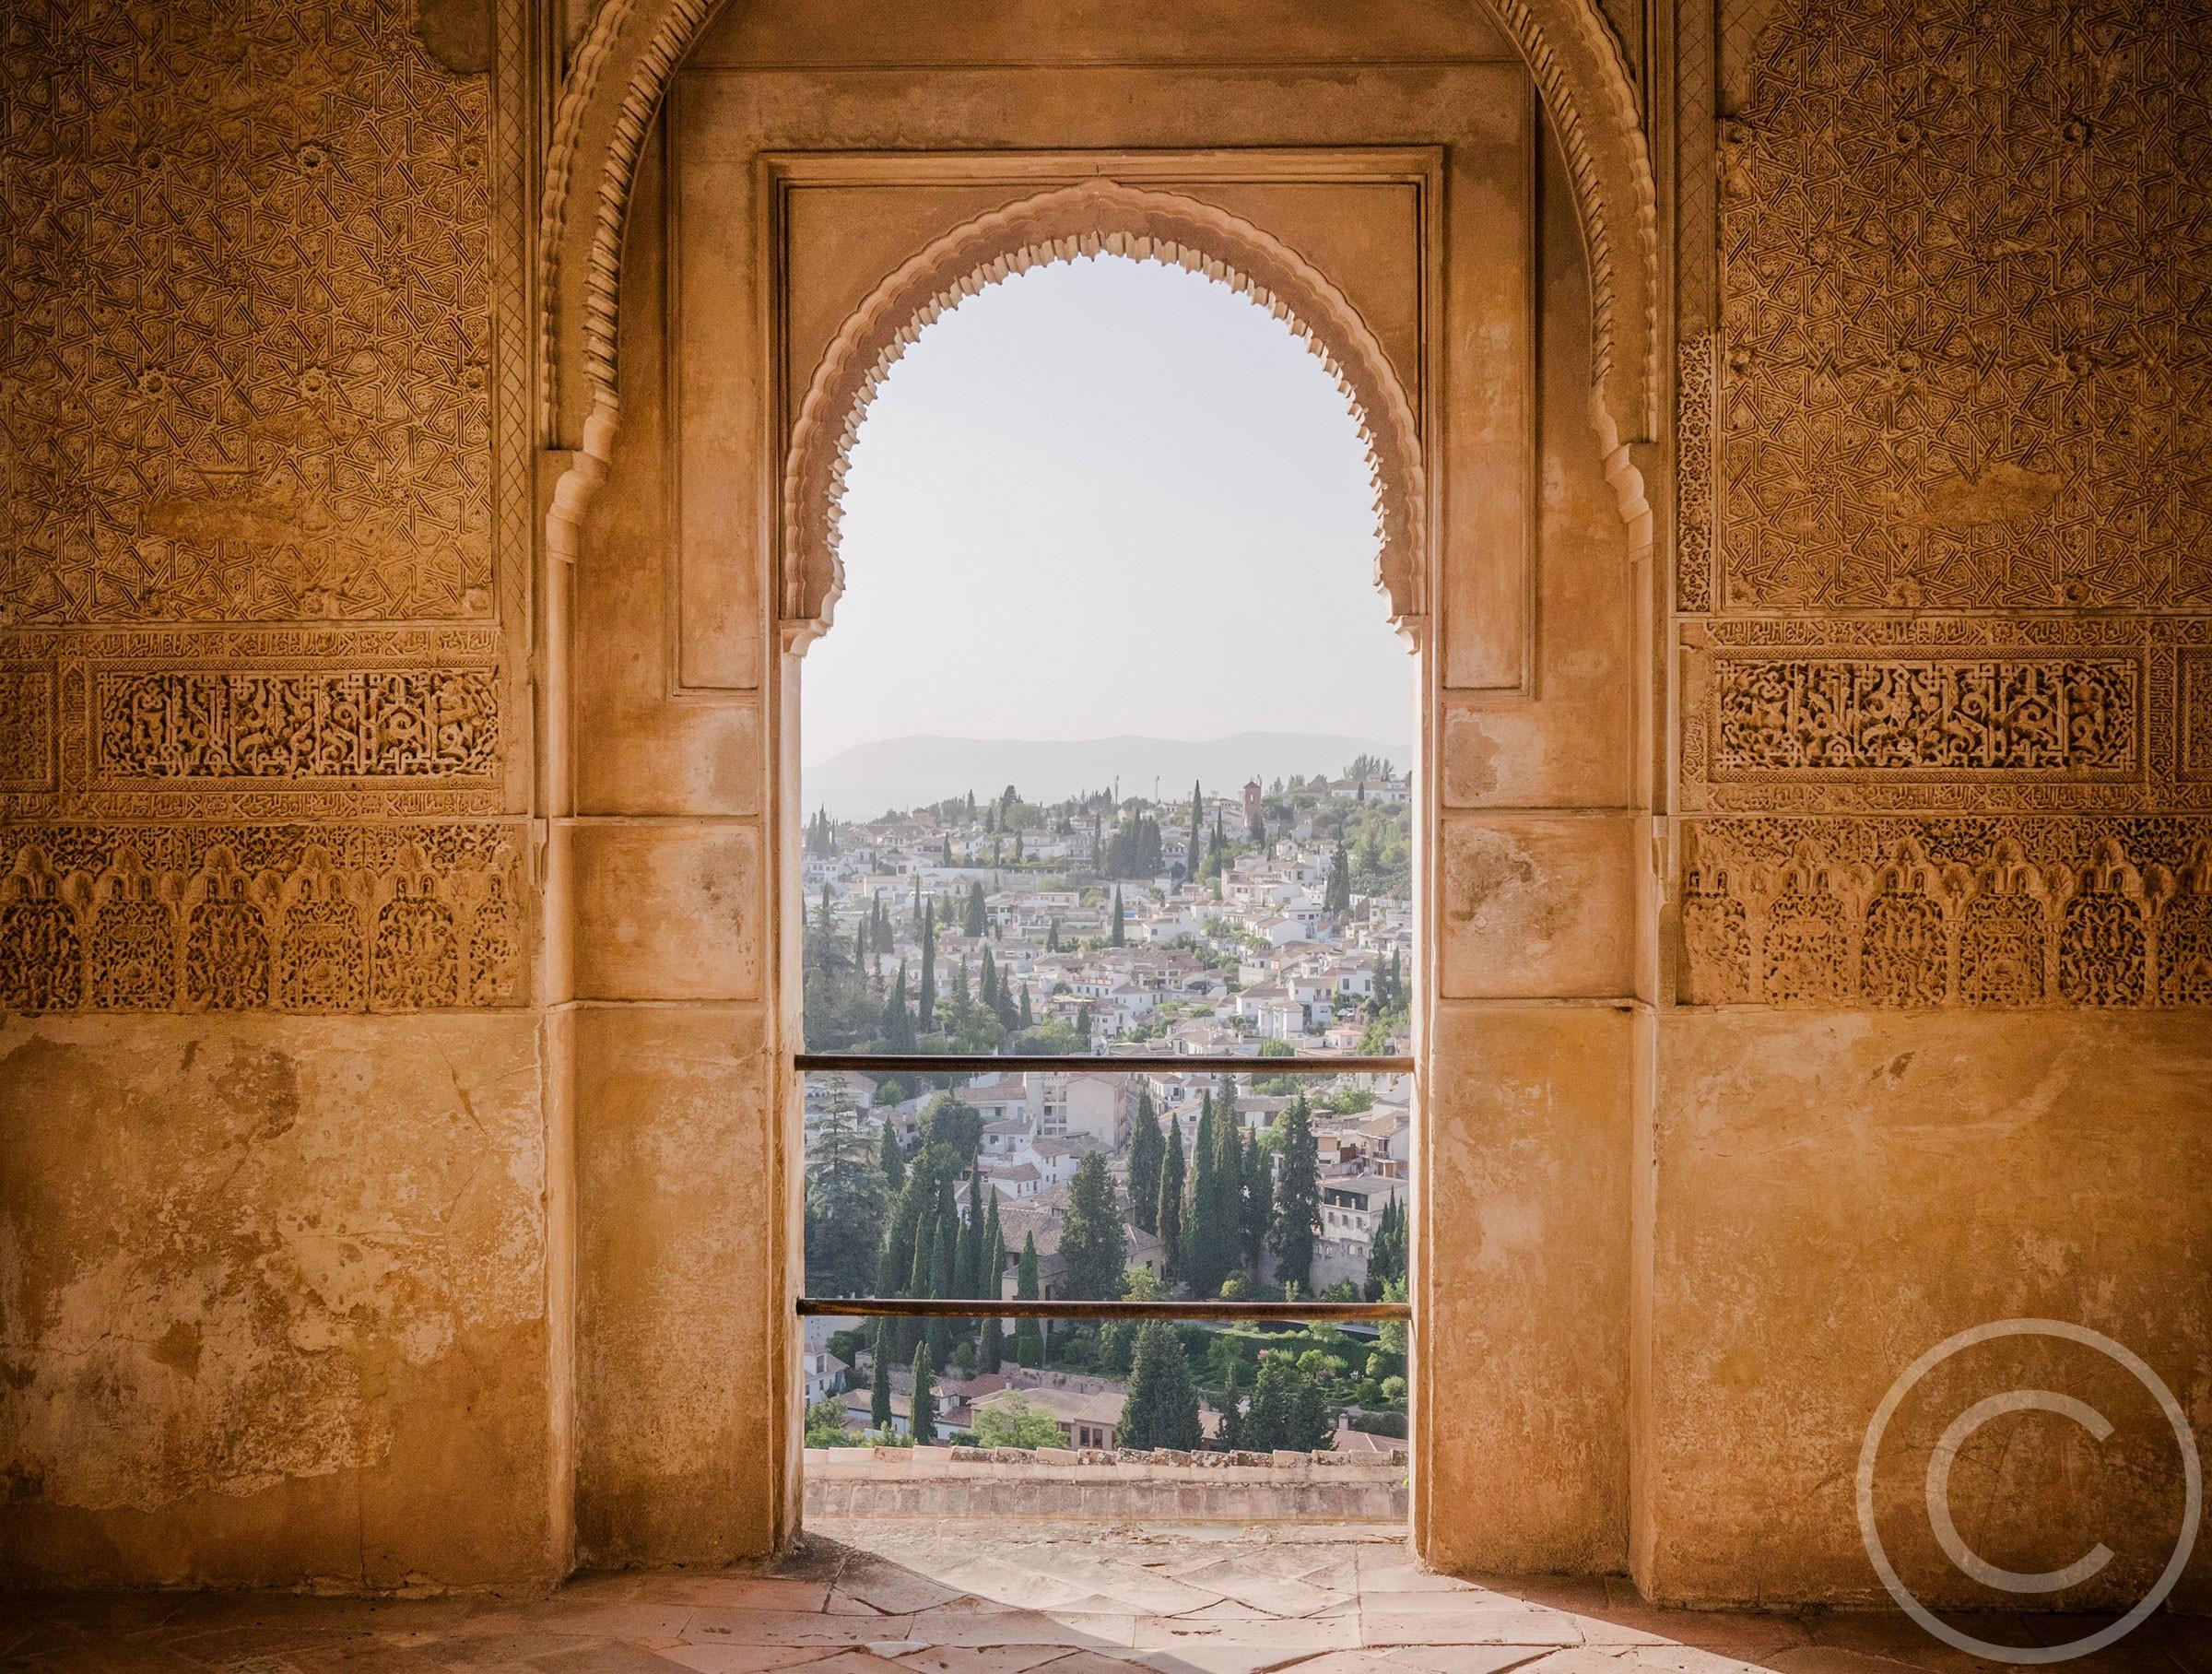 Mosque Expenses